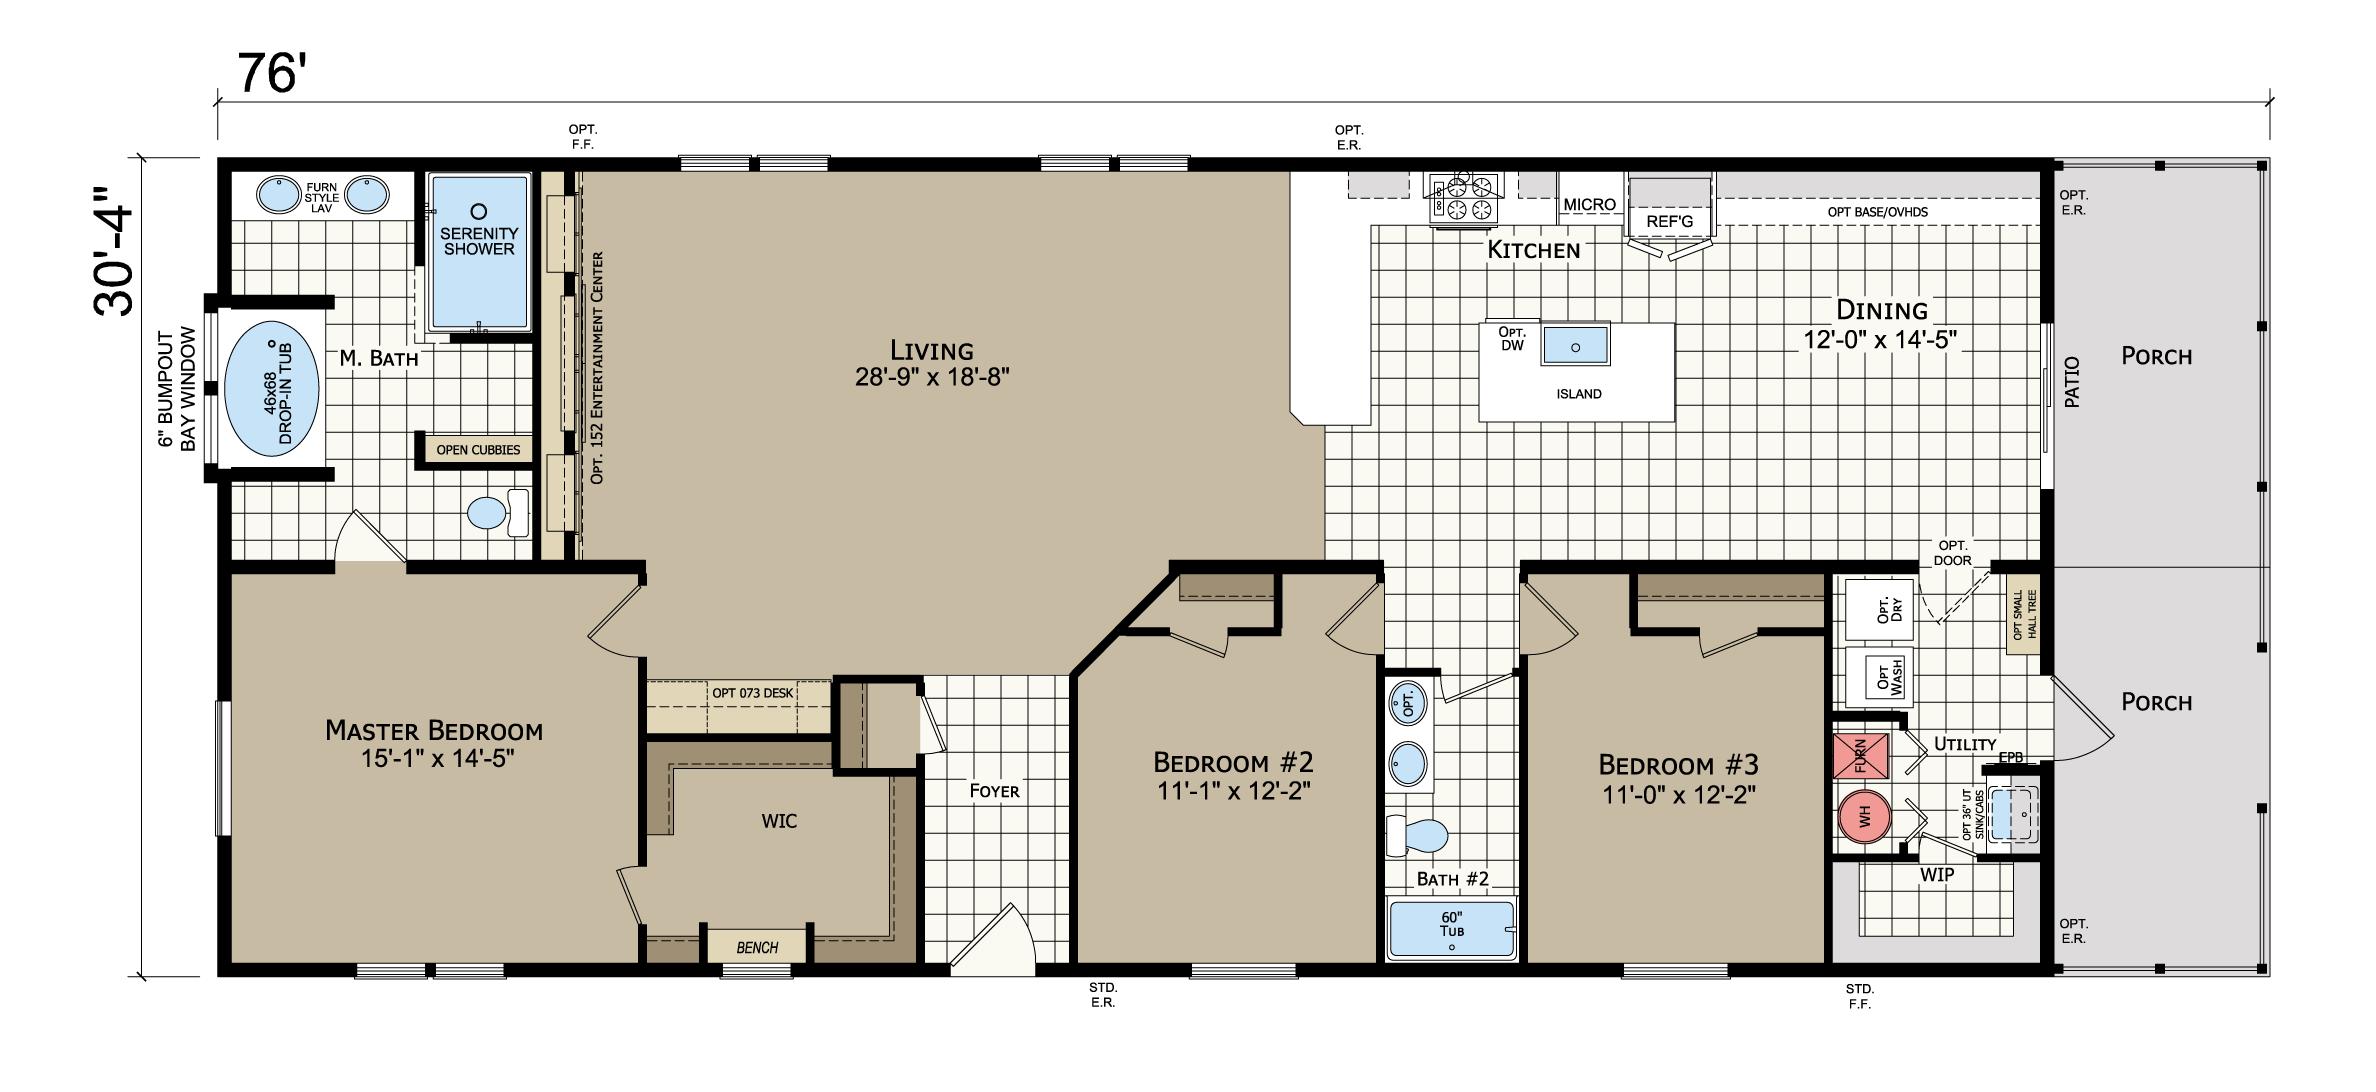 floorplan image for unit 383